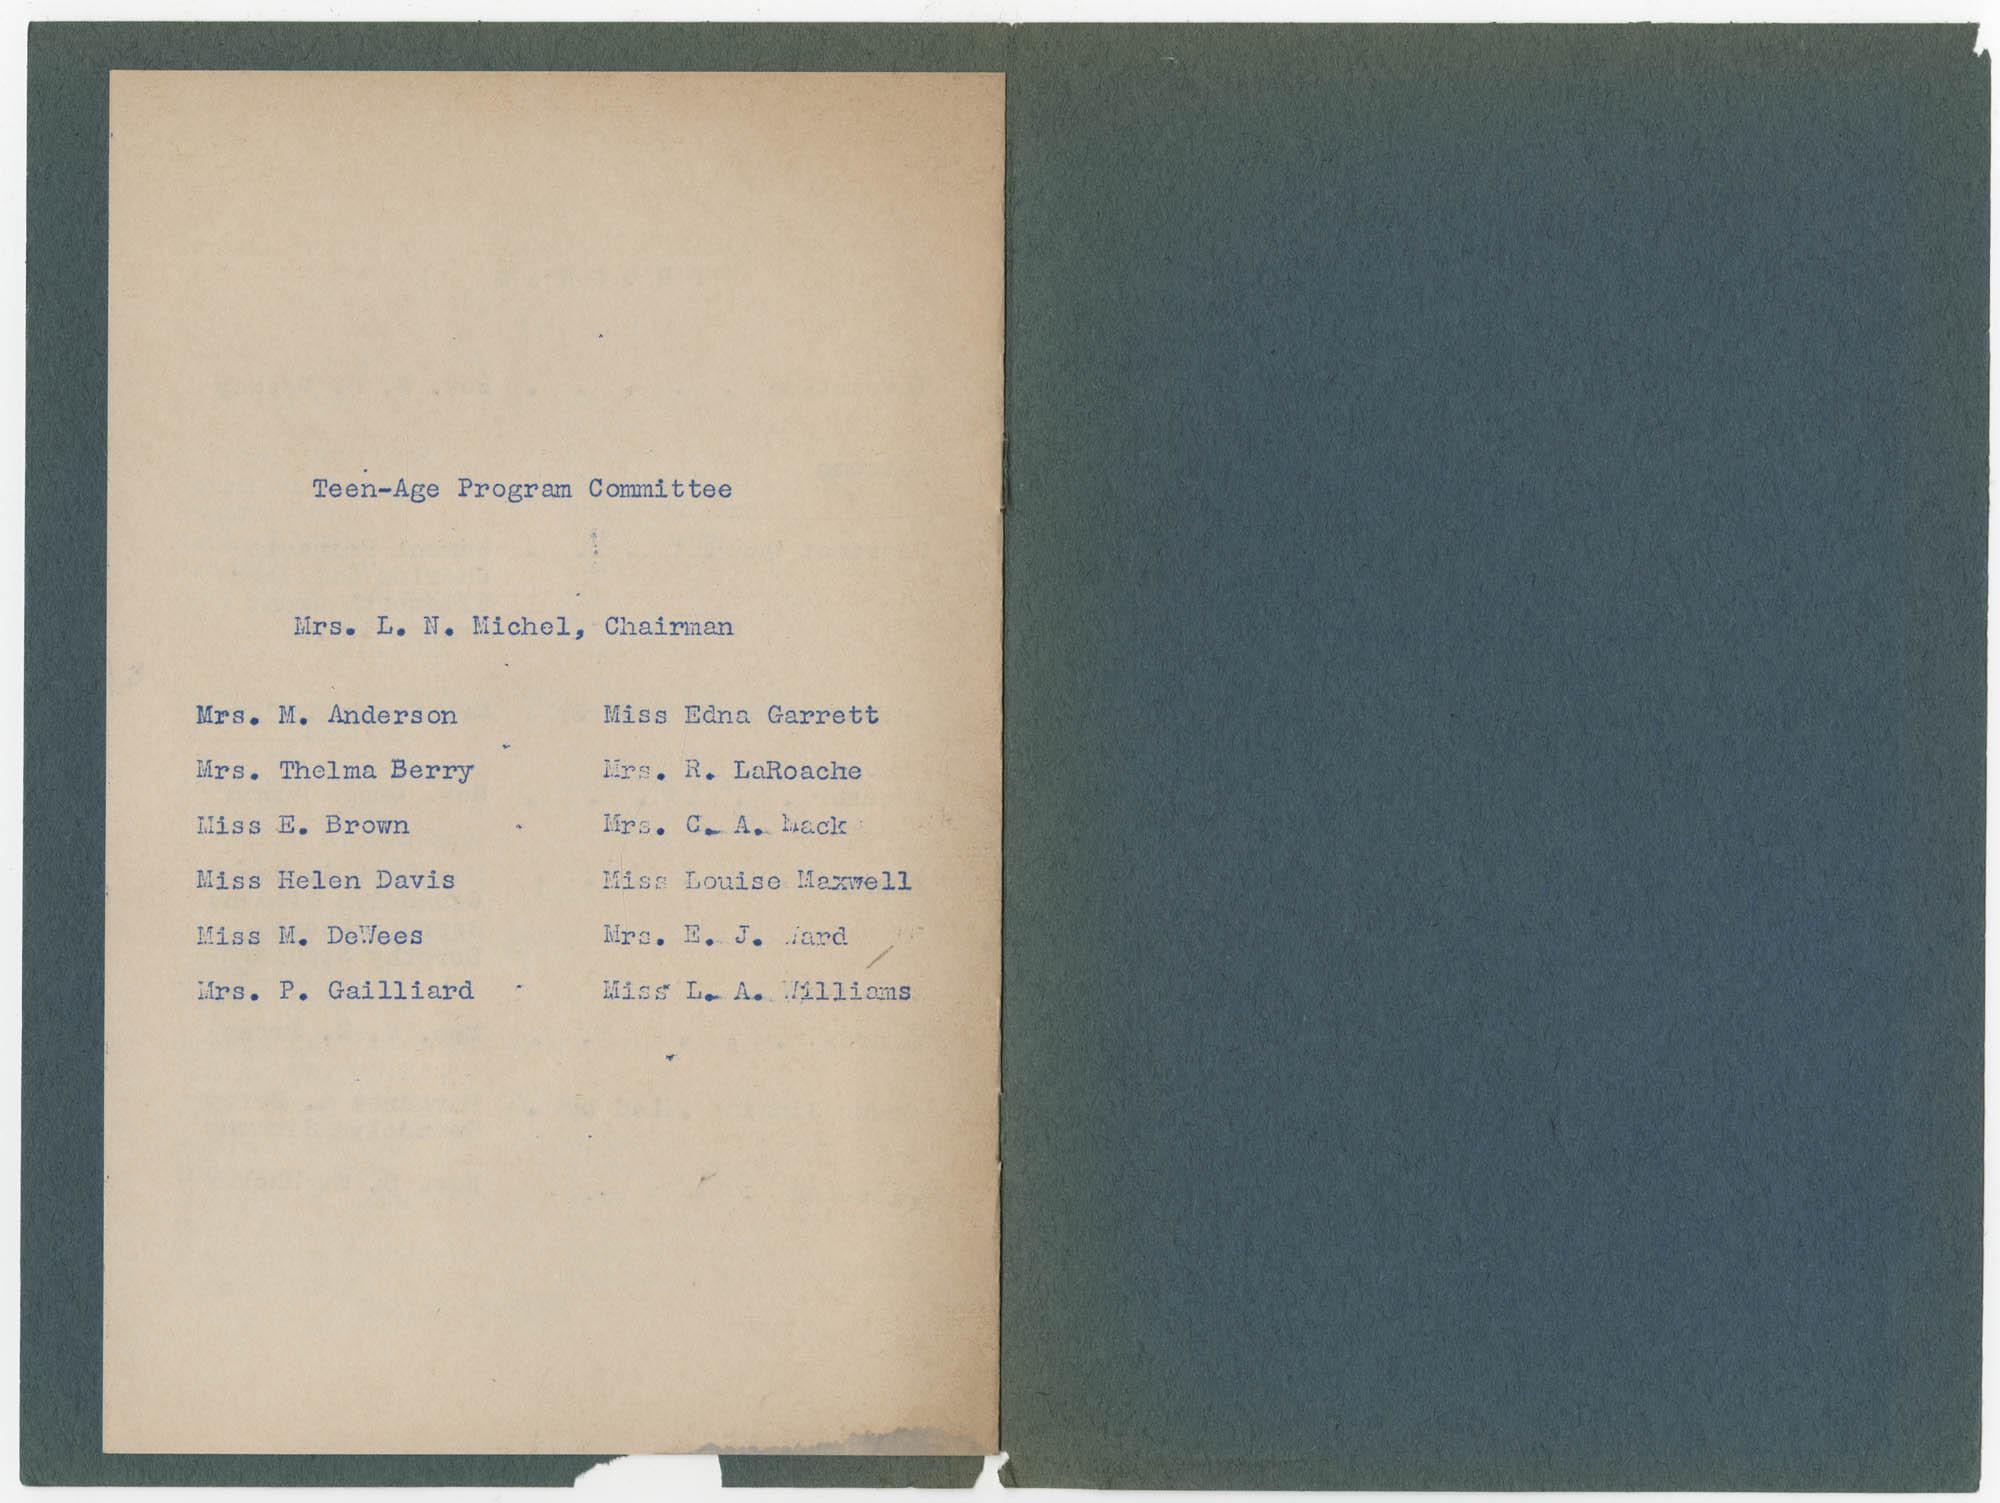 Coming Street Y.W.C.A. Scrapbook, 1953-1957, Page 135, Interior Page 4